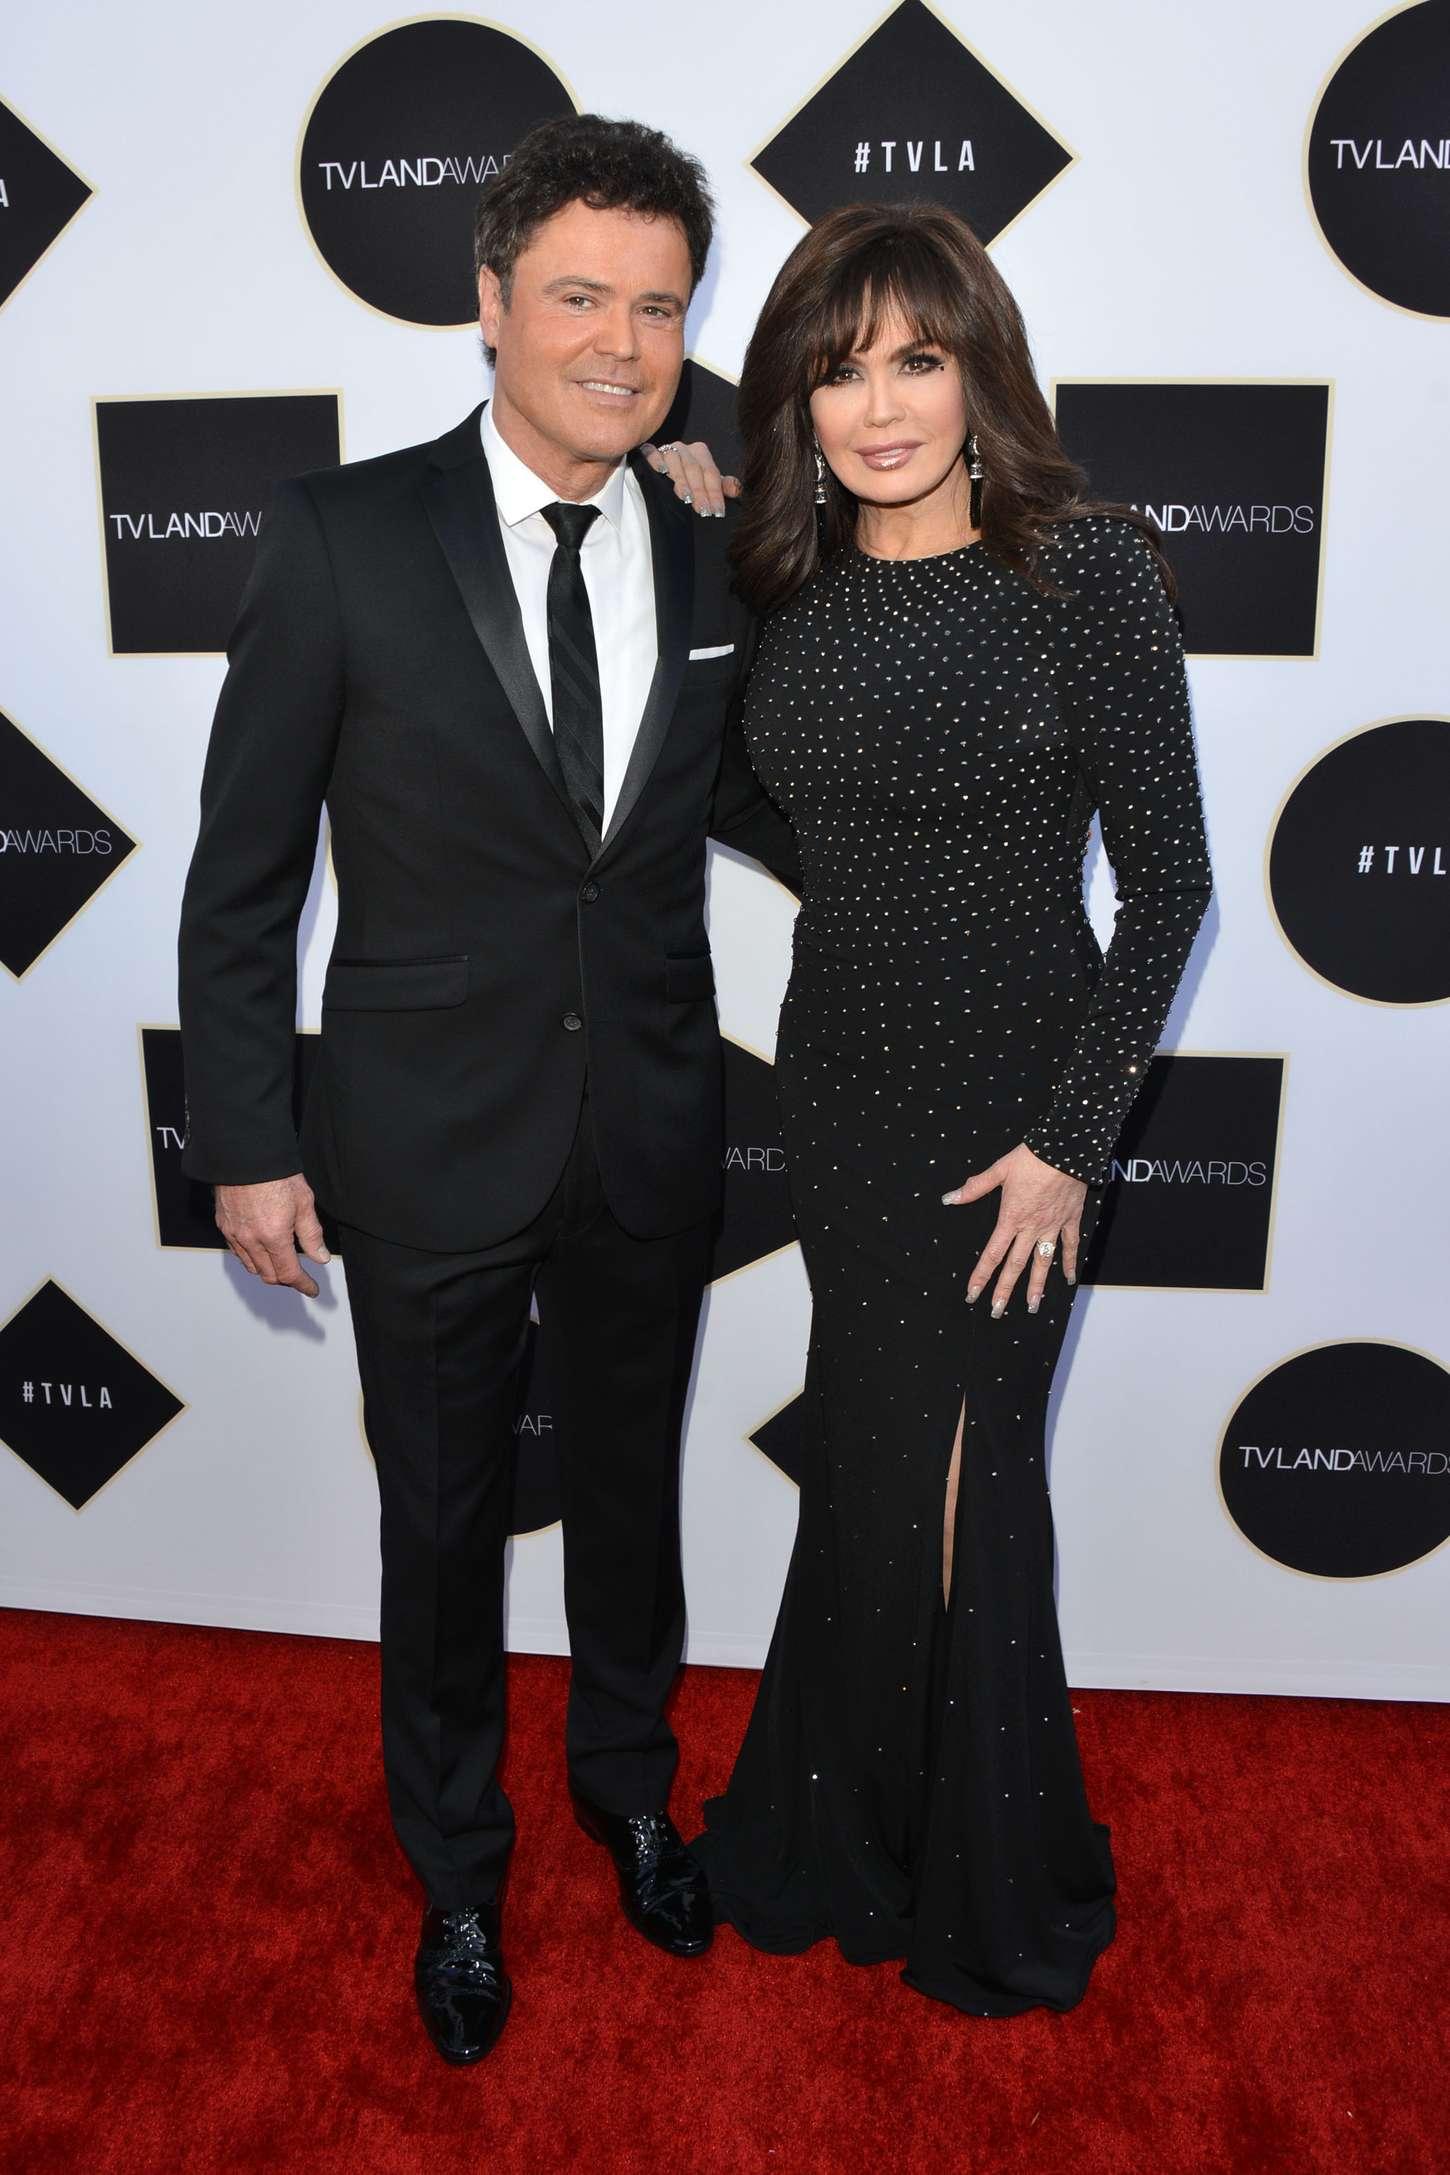 Marie Osmond TV LAND Awards in Beverly Hills